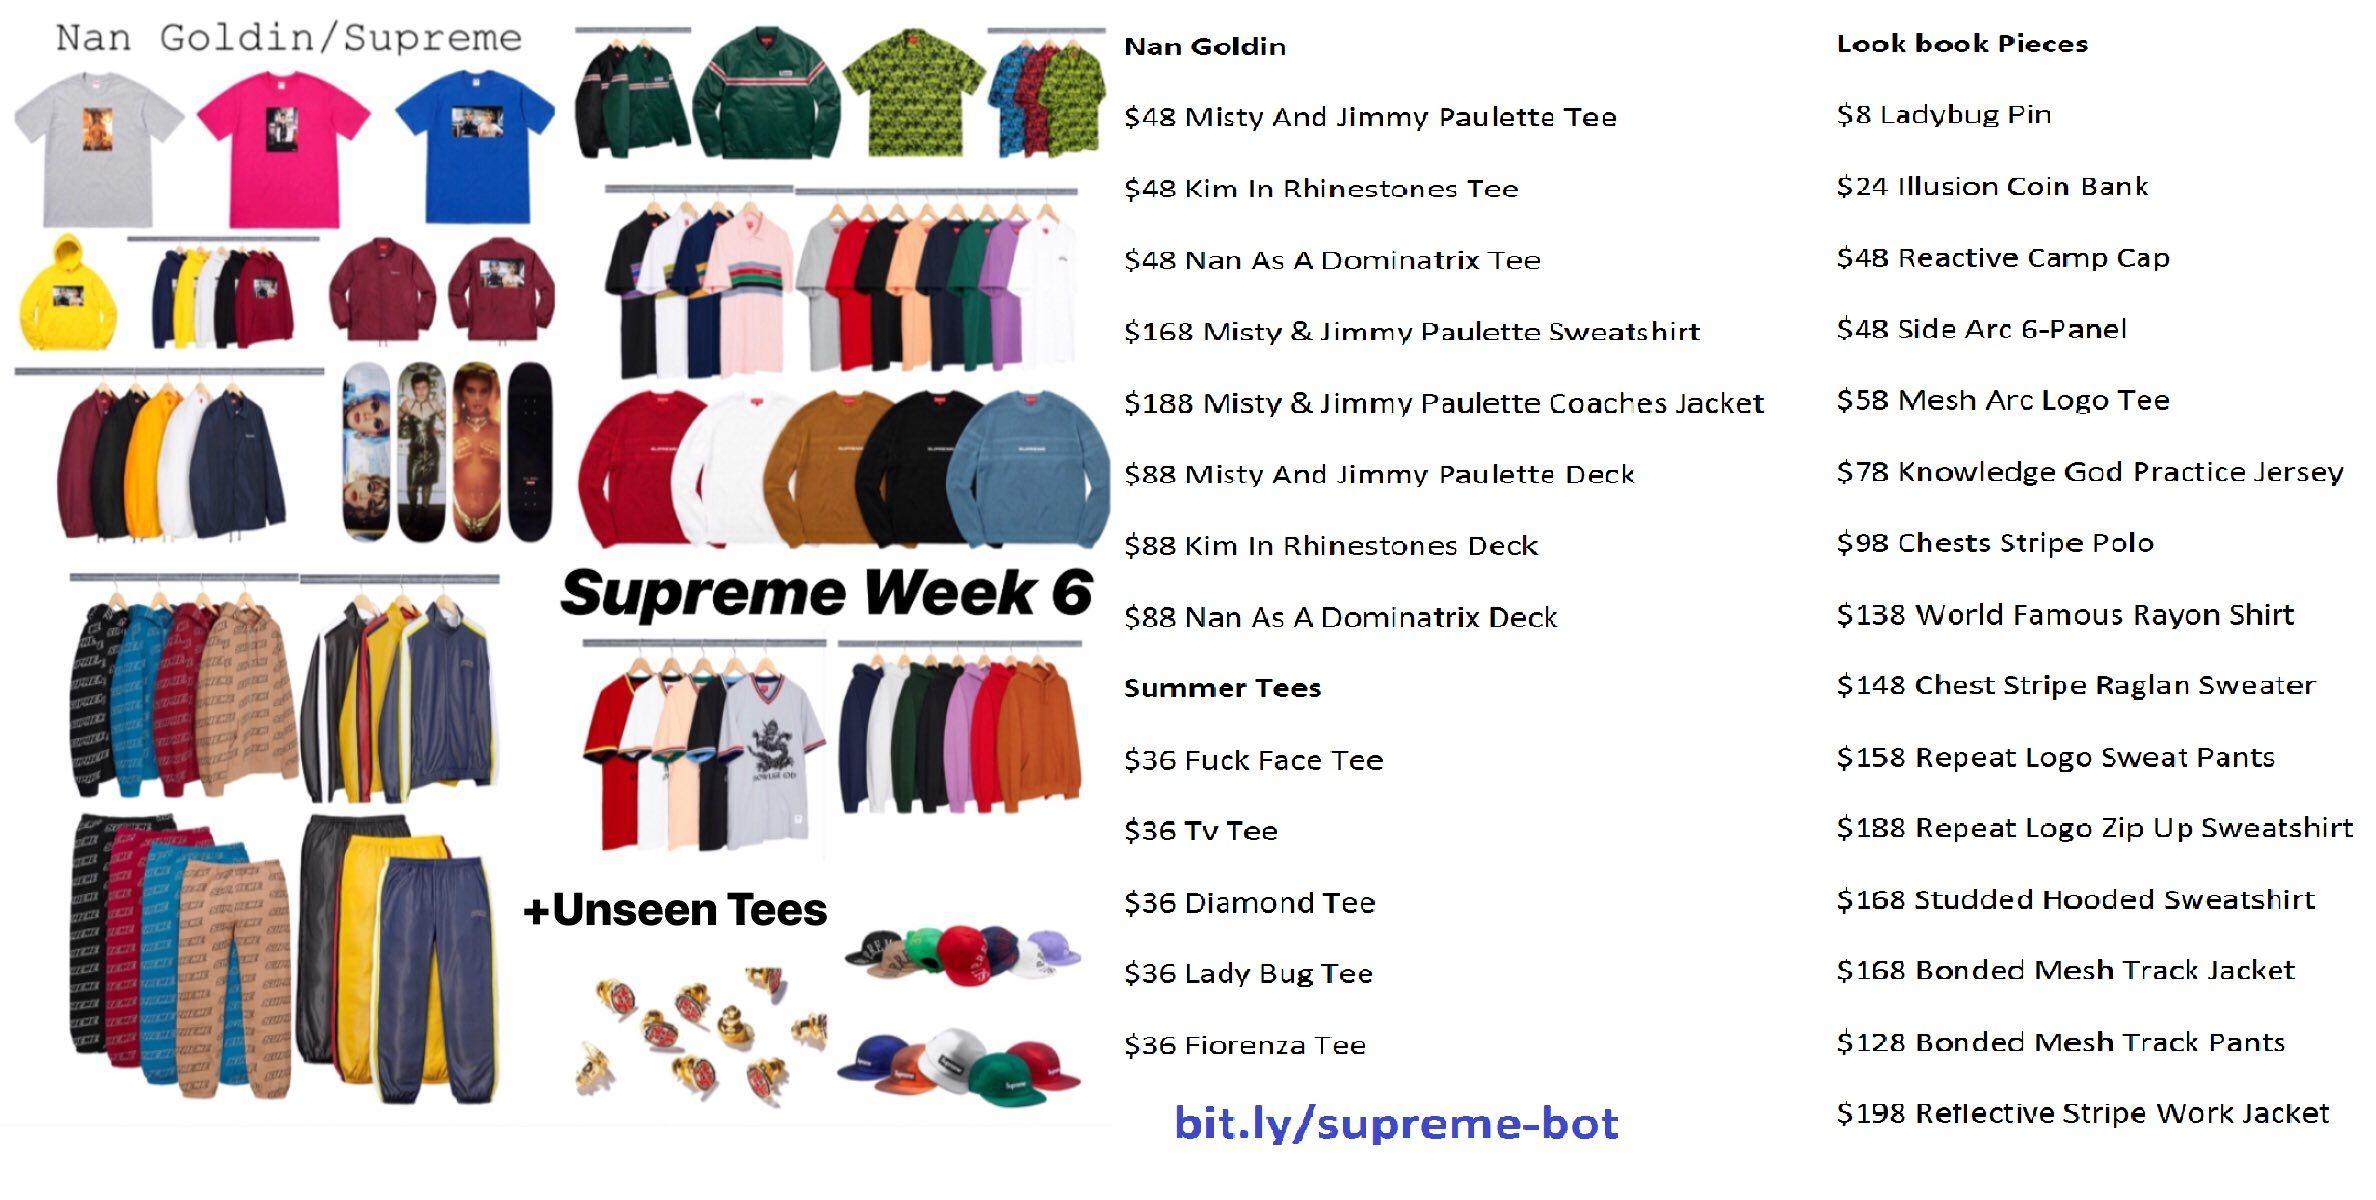 ae0cc43ed Supreme Week 6 Drop List  amp  Retails Nan Goldin For Supreme Unseen Summer  Tees  amp